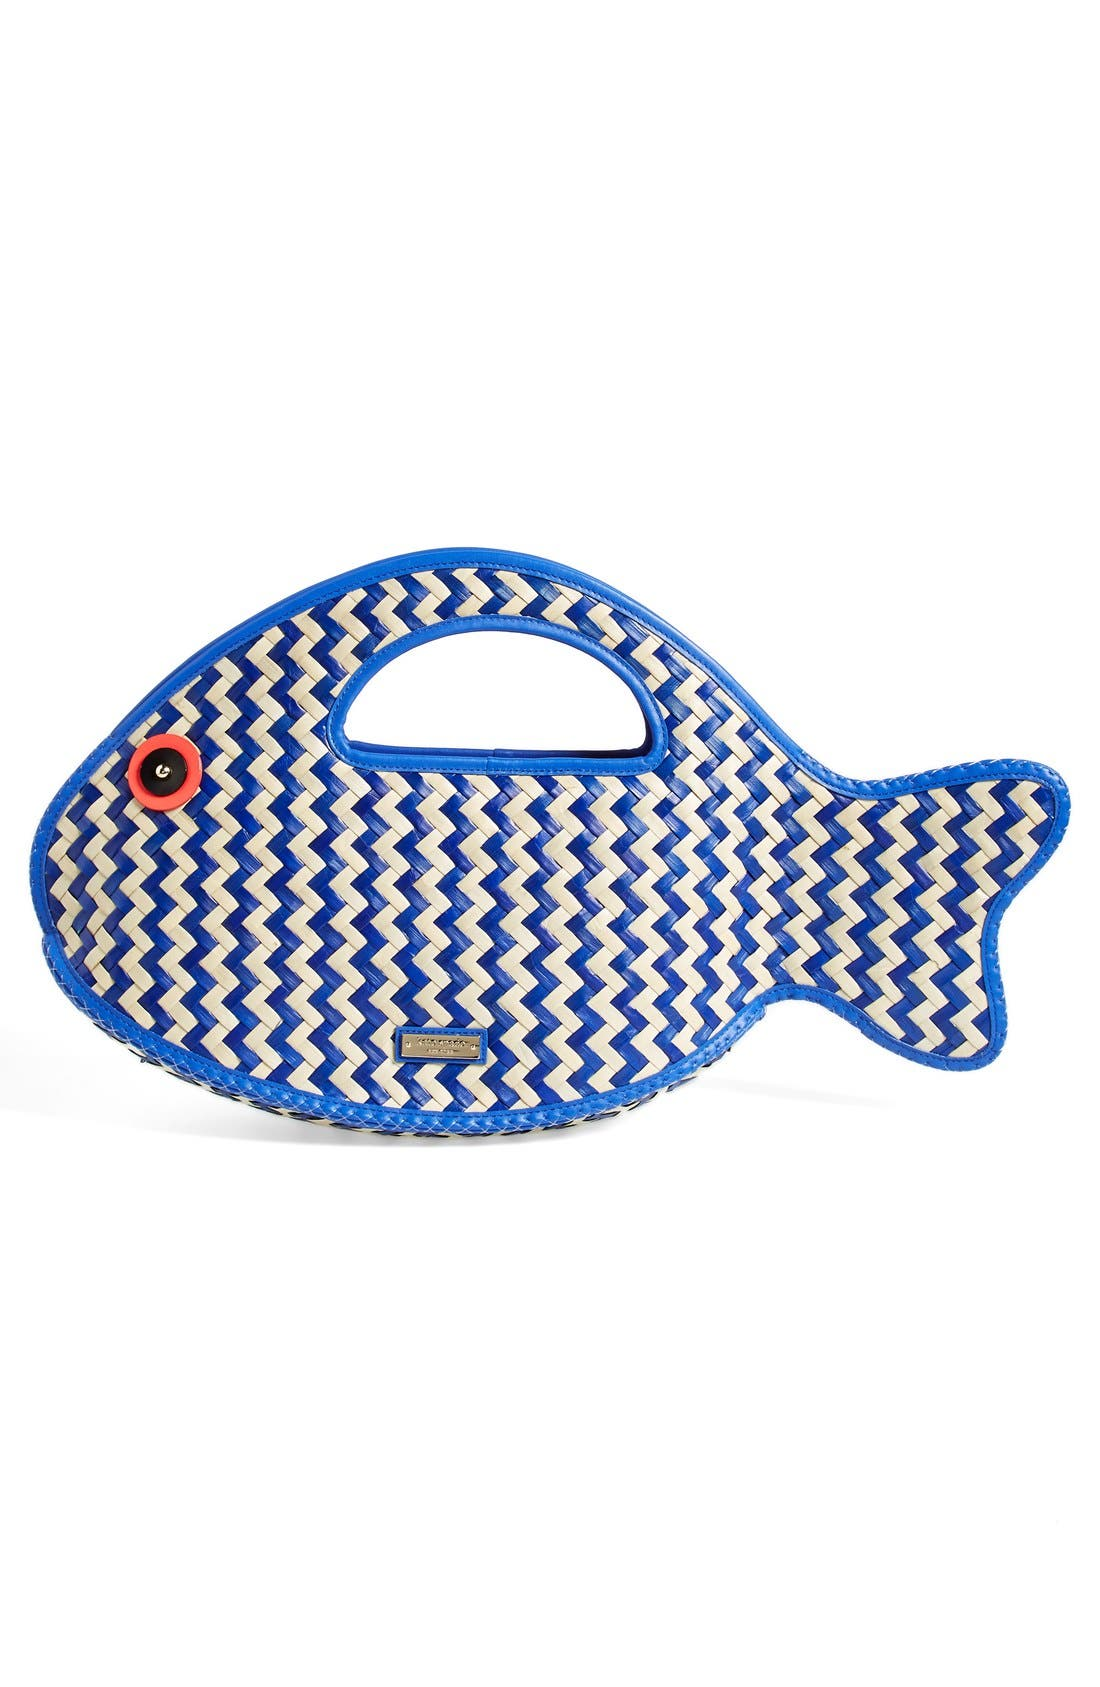 Alternate Image 3  - kate spade new york 'splash out - fish' straw tote